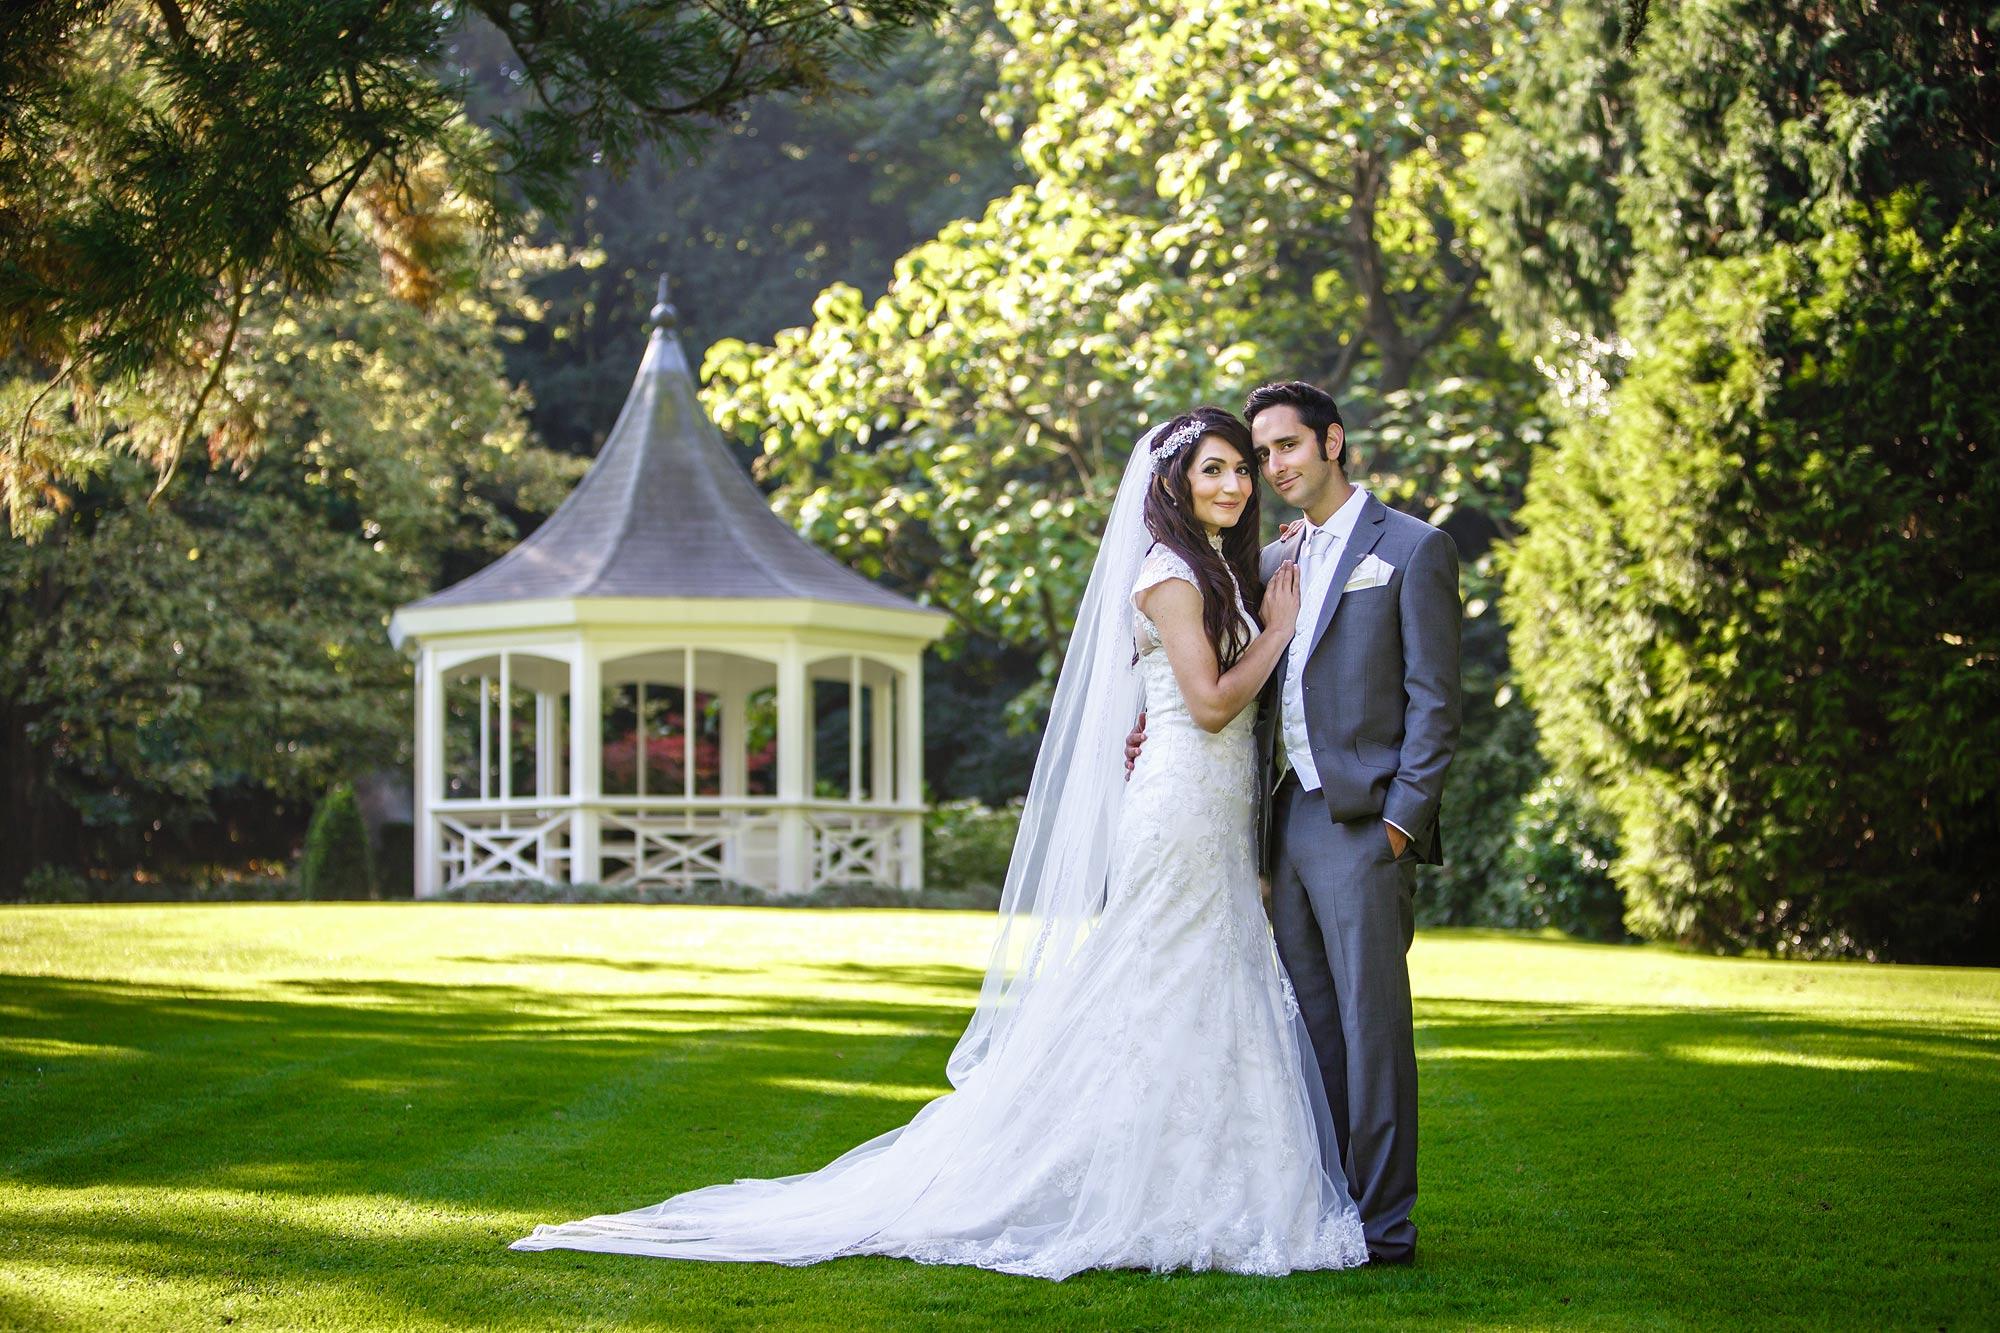 Wedding Photography Reshoot Orangery Maidstone